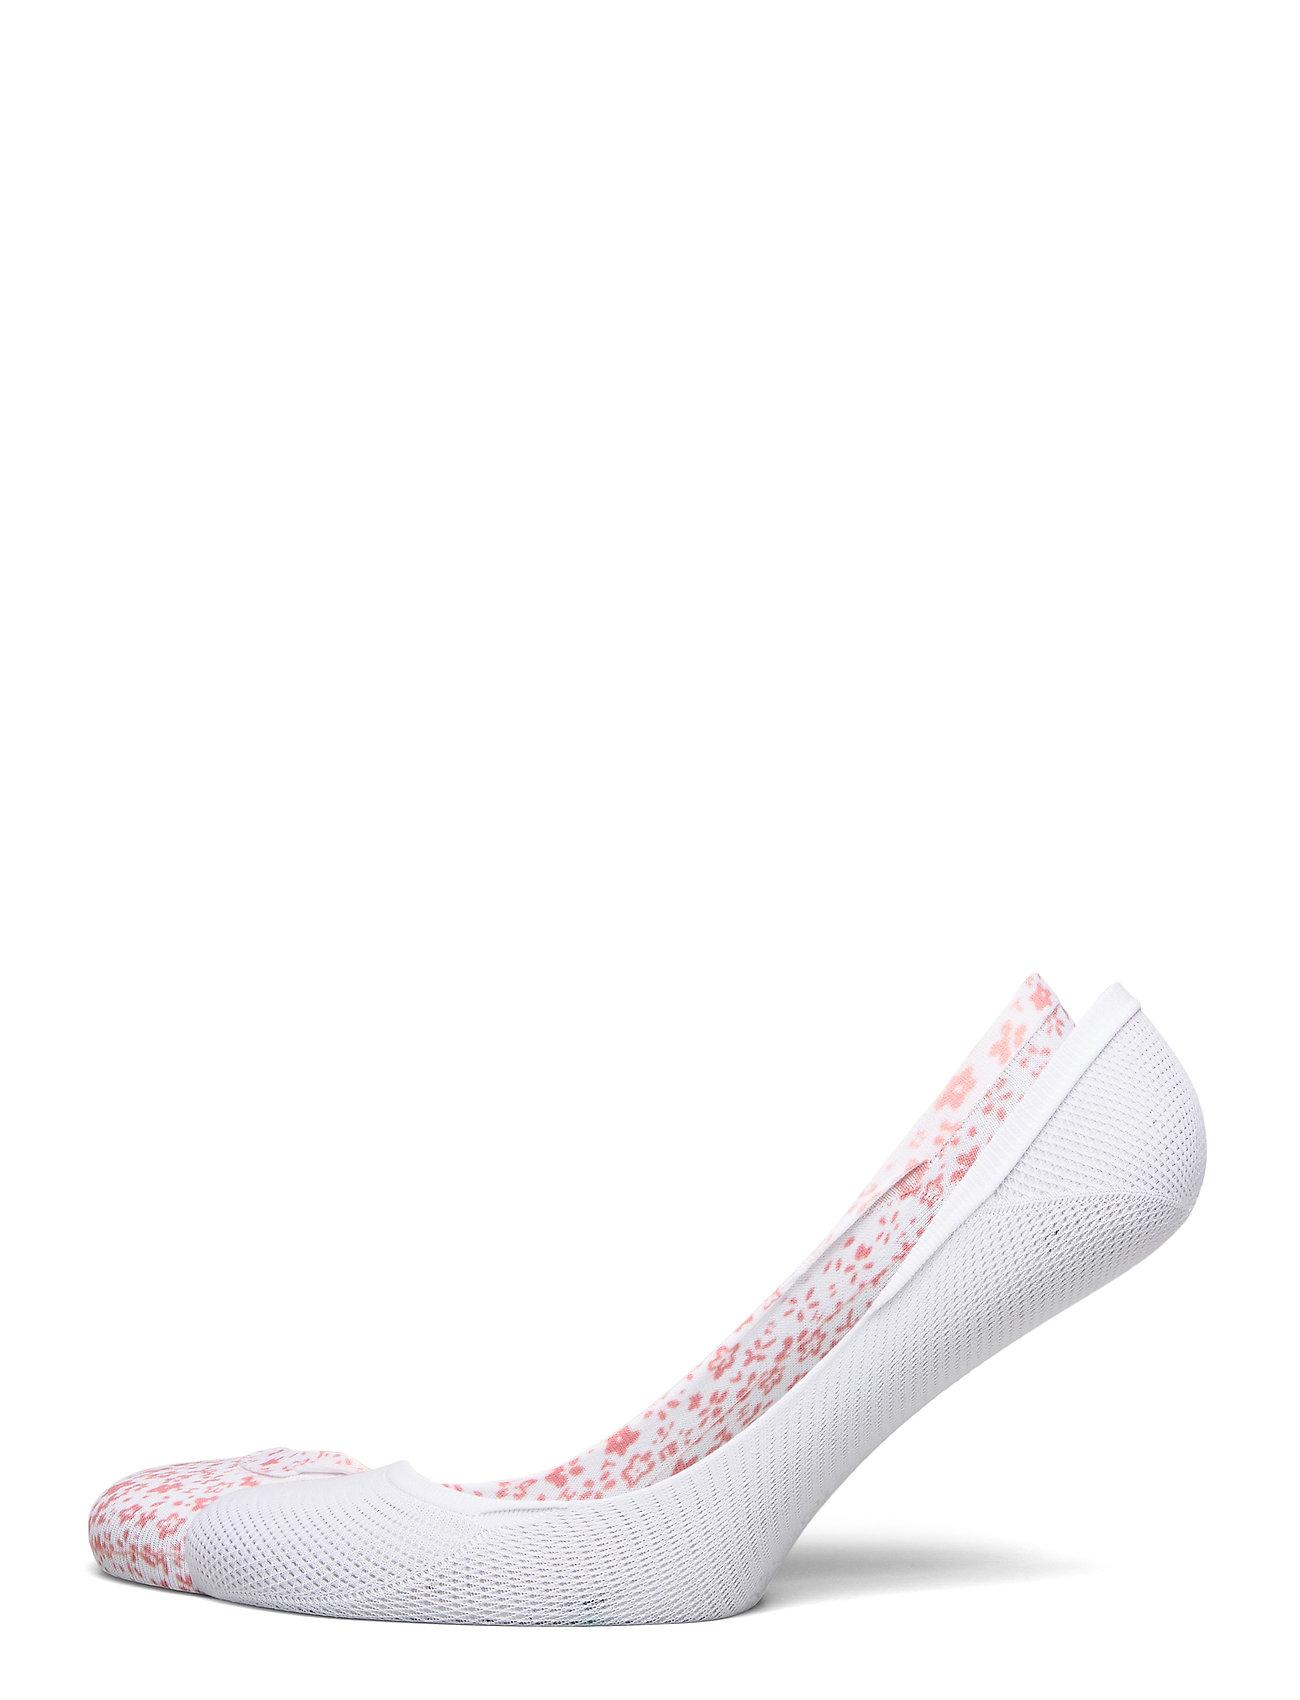 Image of Th Women Footie 2p Ditsy Floral Lingerie Socks Footies/Ankle Socks Hvid Tommy Hilfiger (3416359939)